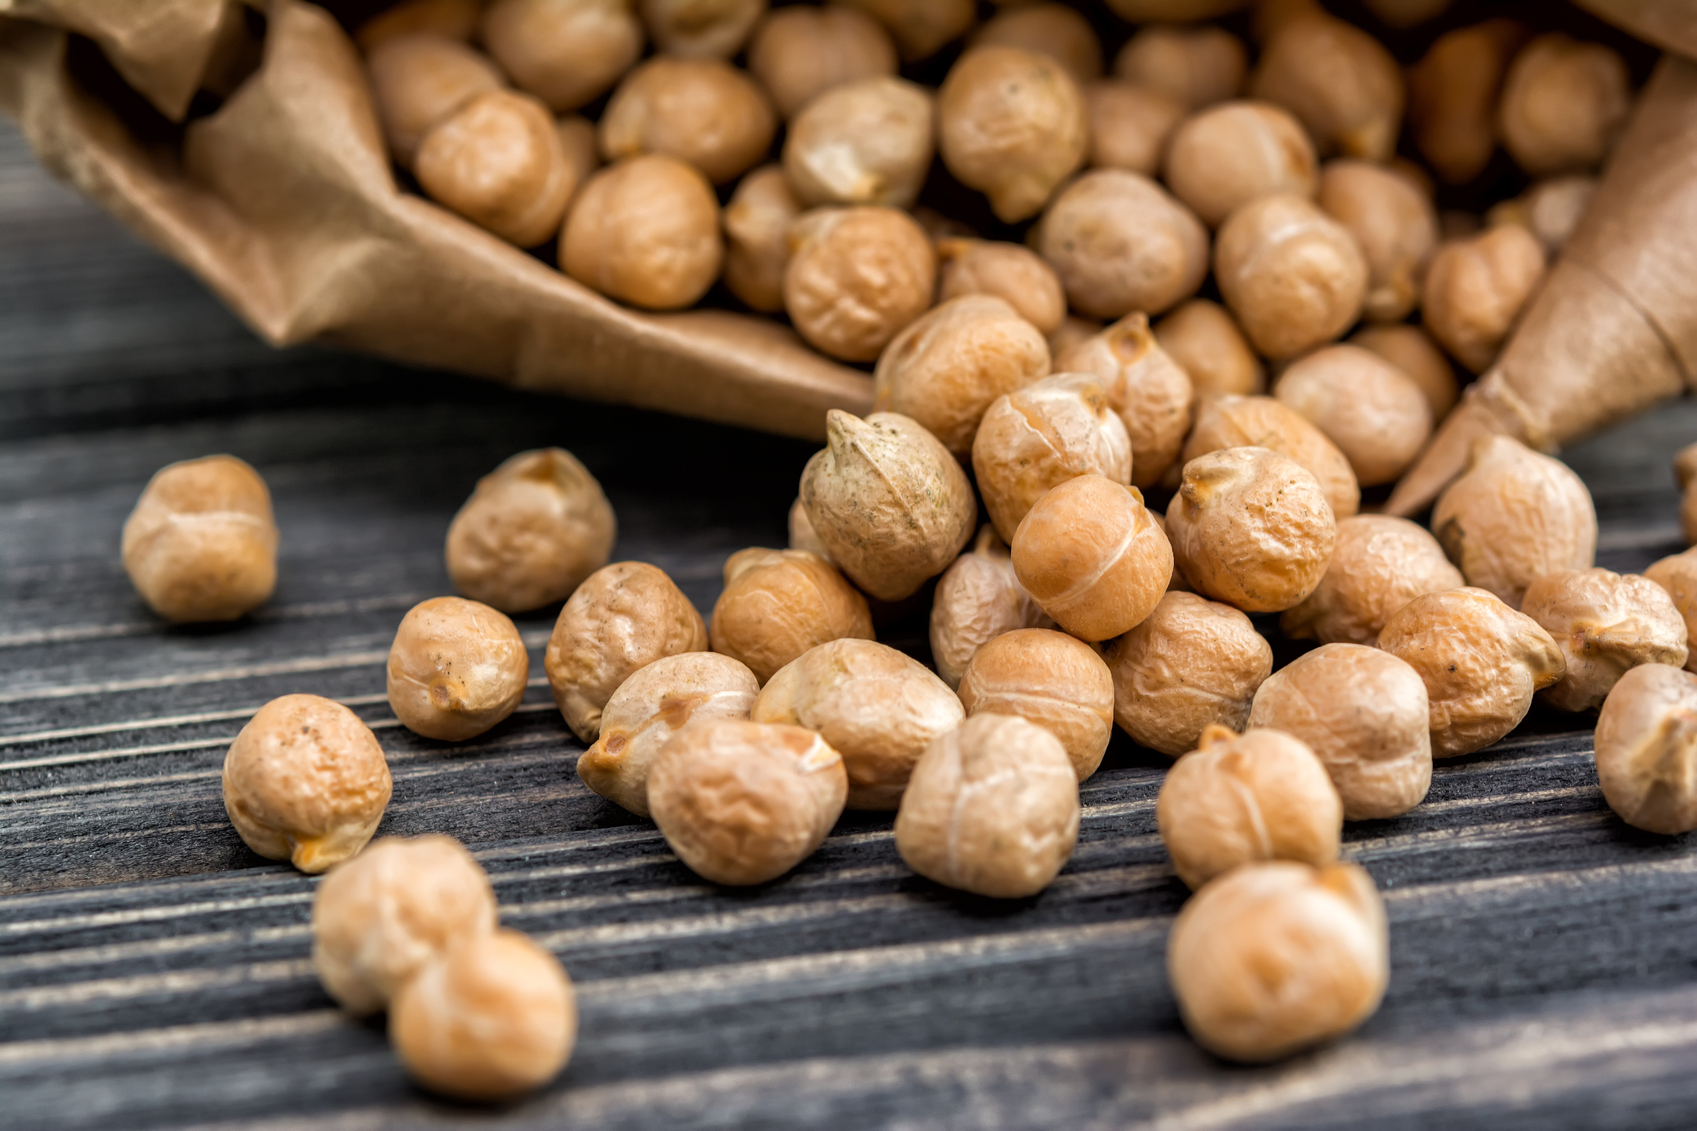 health benefits of chickpeas health benefits of garbanzo beans